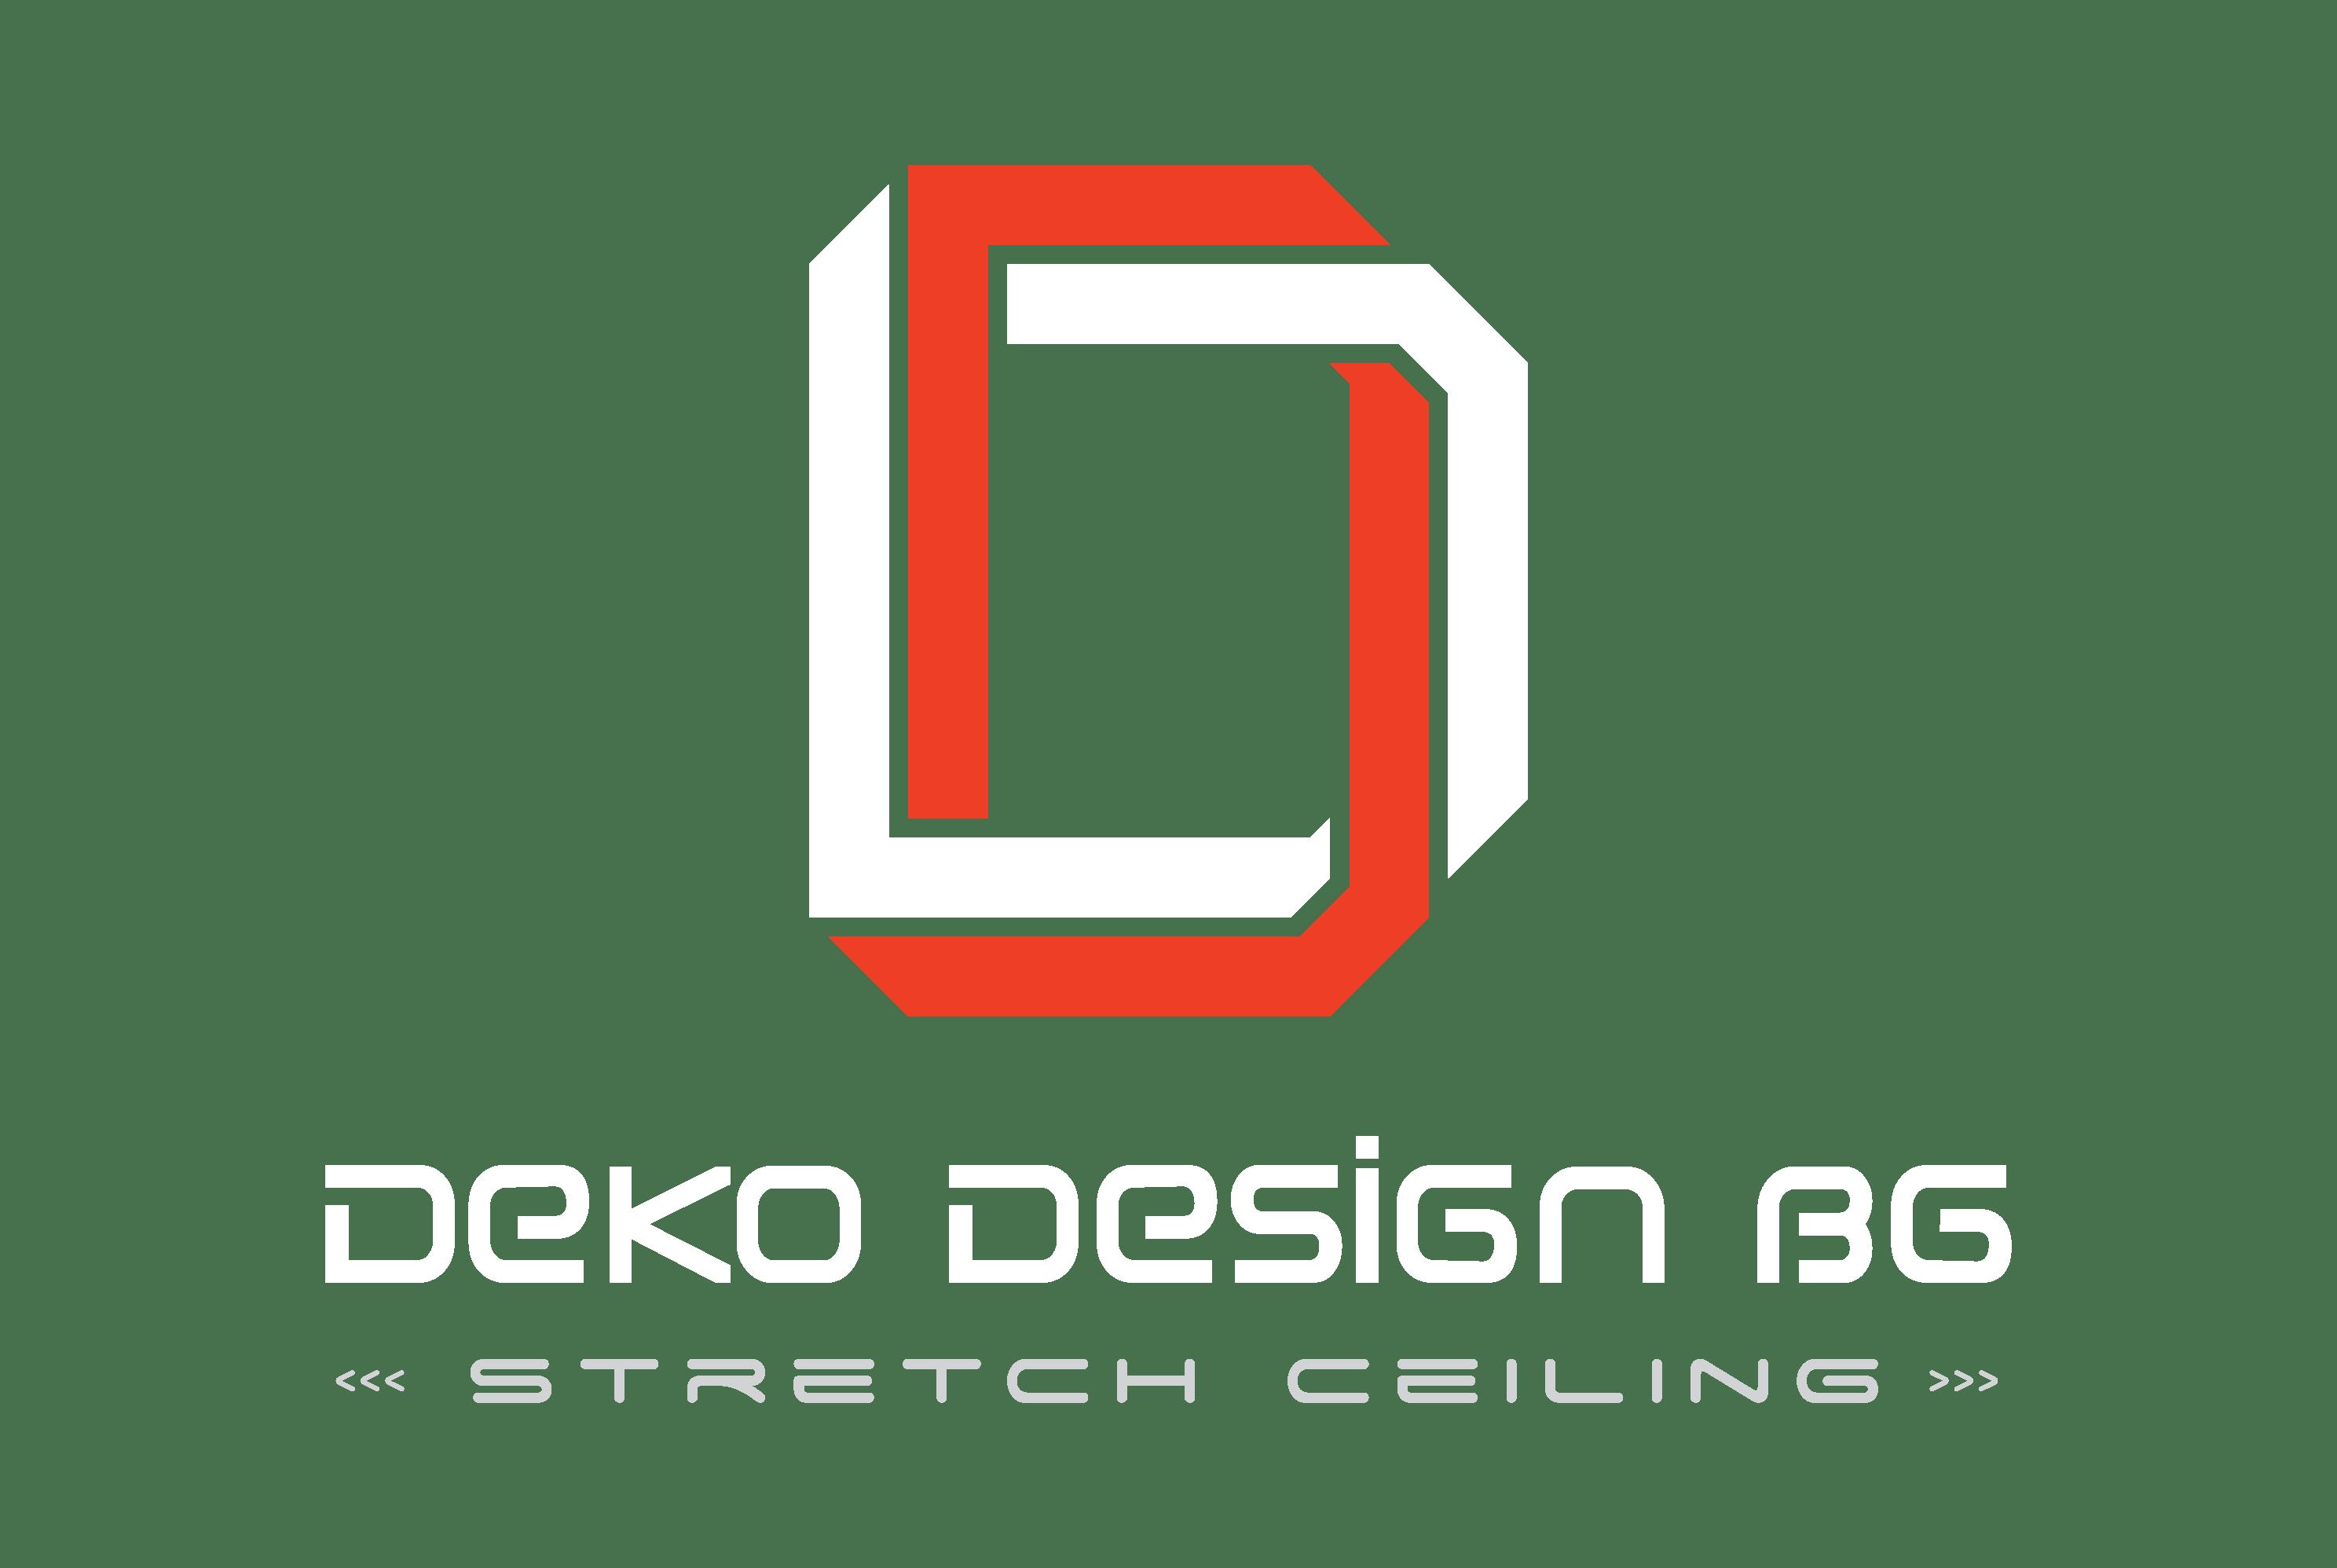 Deko Design BG